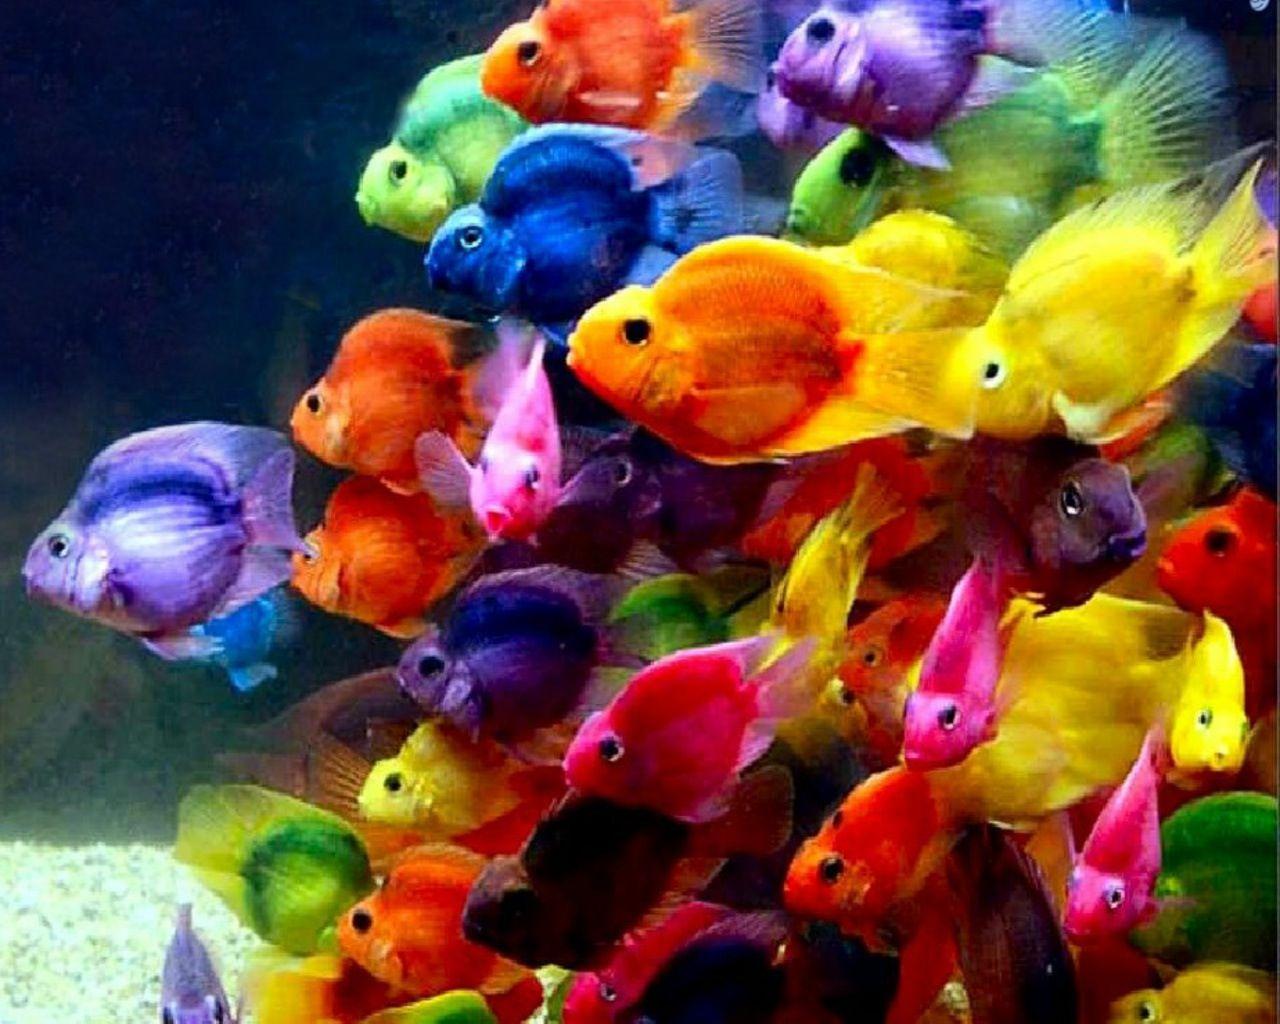 Neon fish   Animals   Pinterest   Neon and Animal